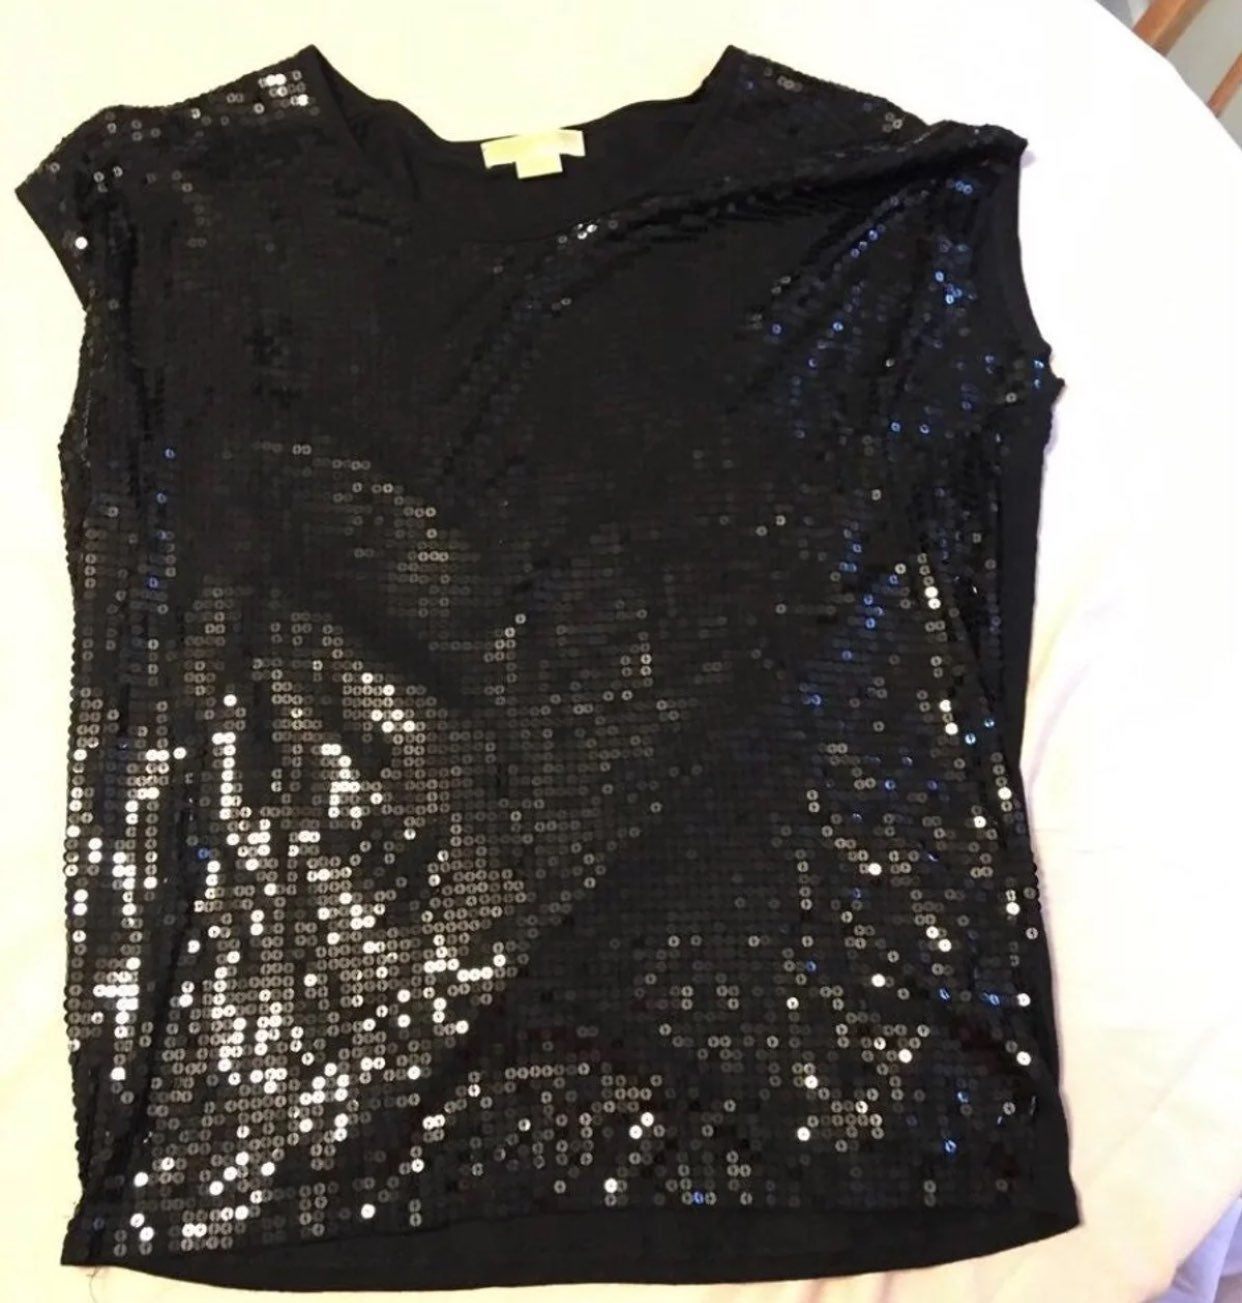 Michael kors shirt & sequins top